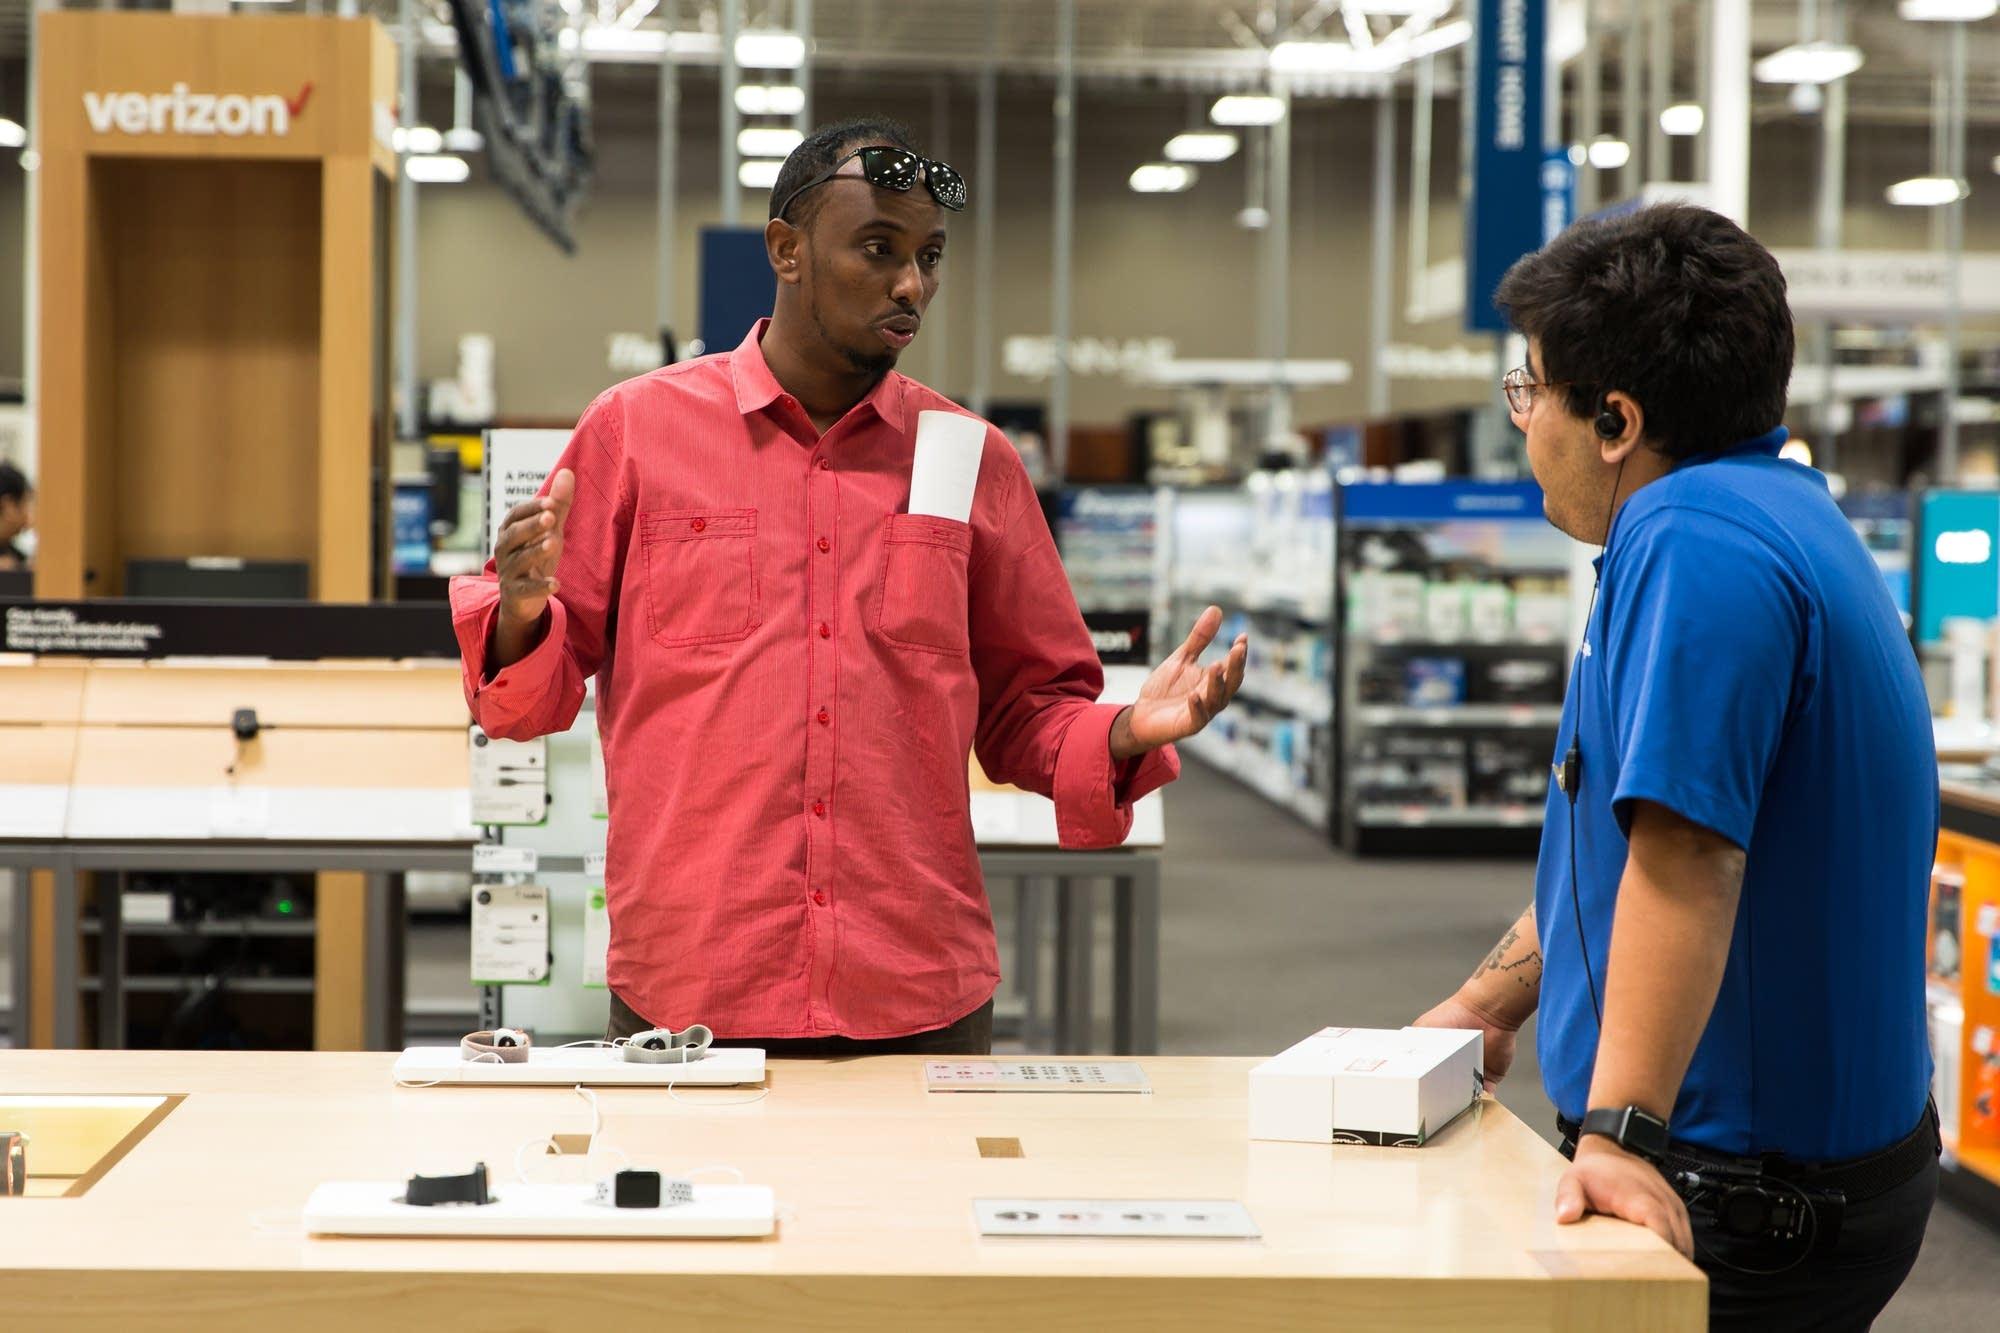 Abdifatah Mohamed asks Best Buy employee Darryn Regalado a question.